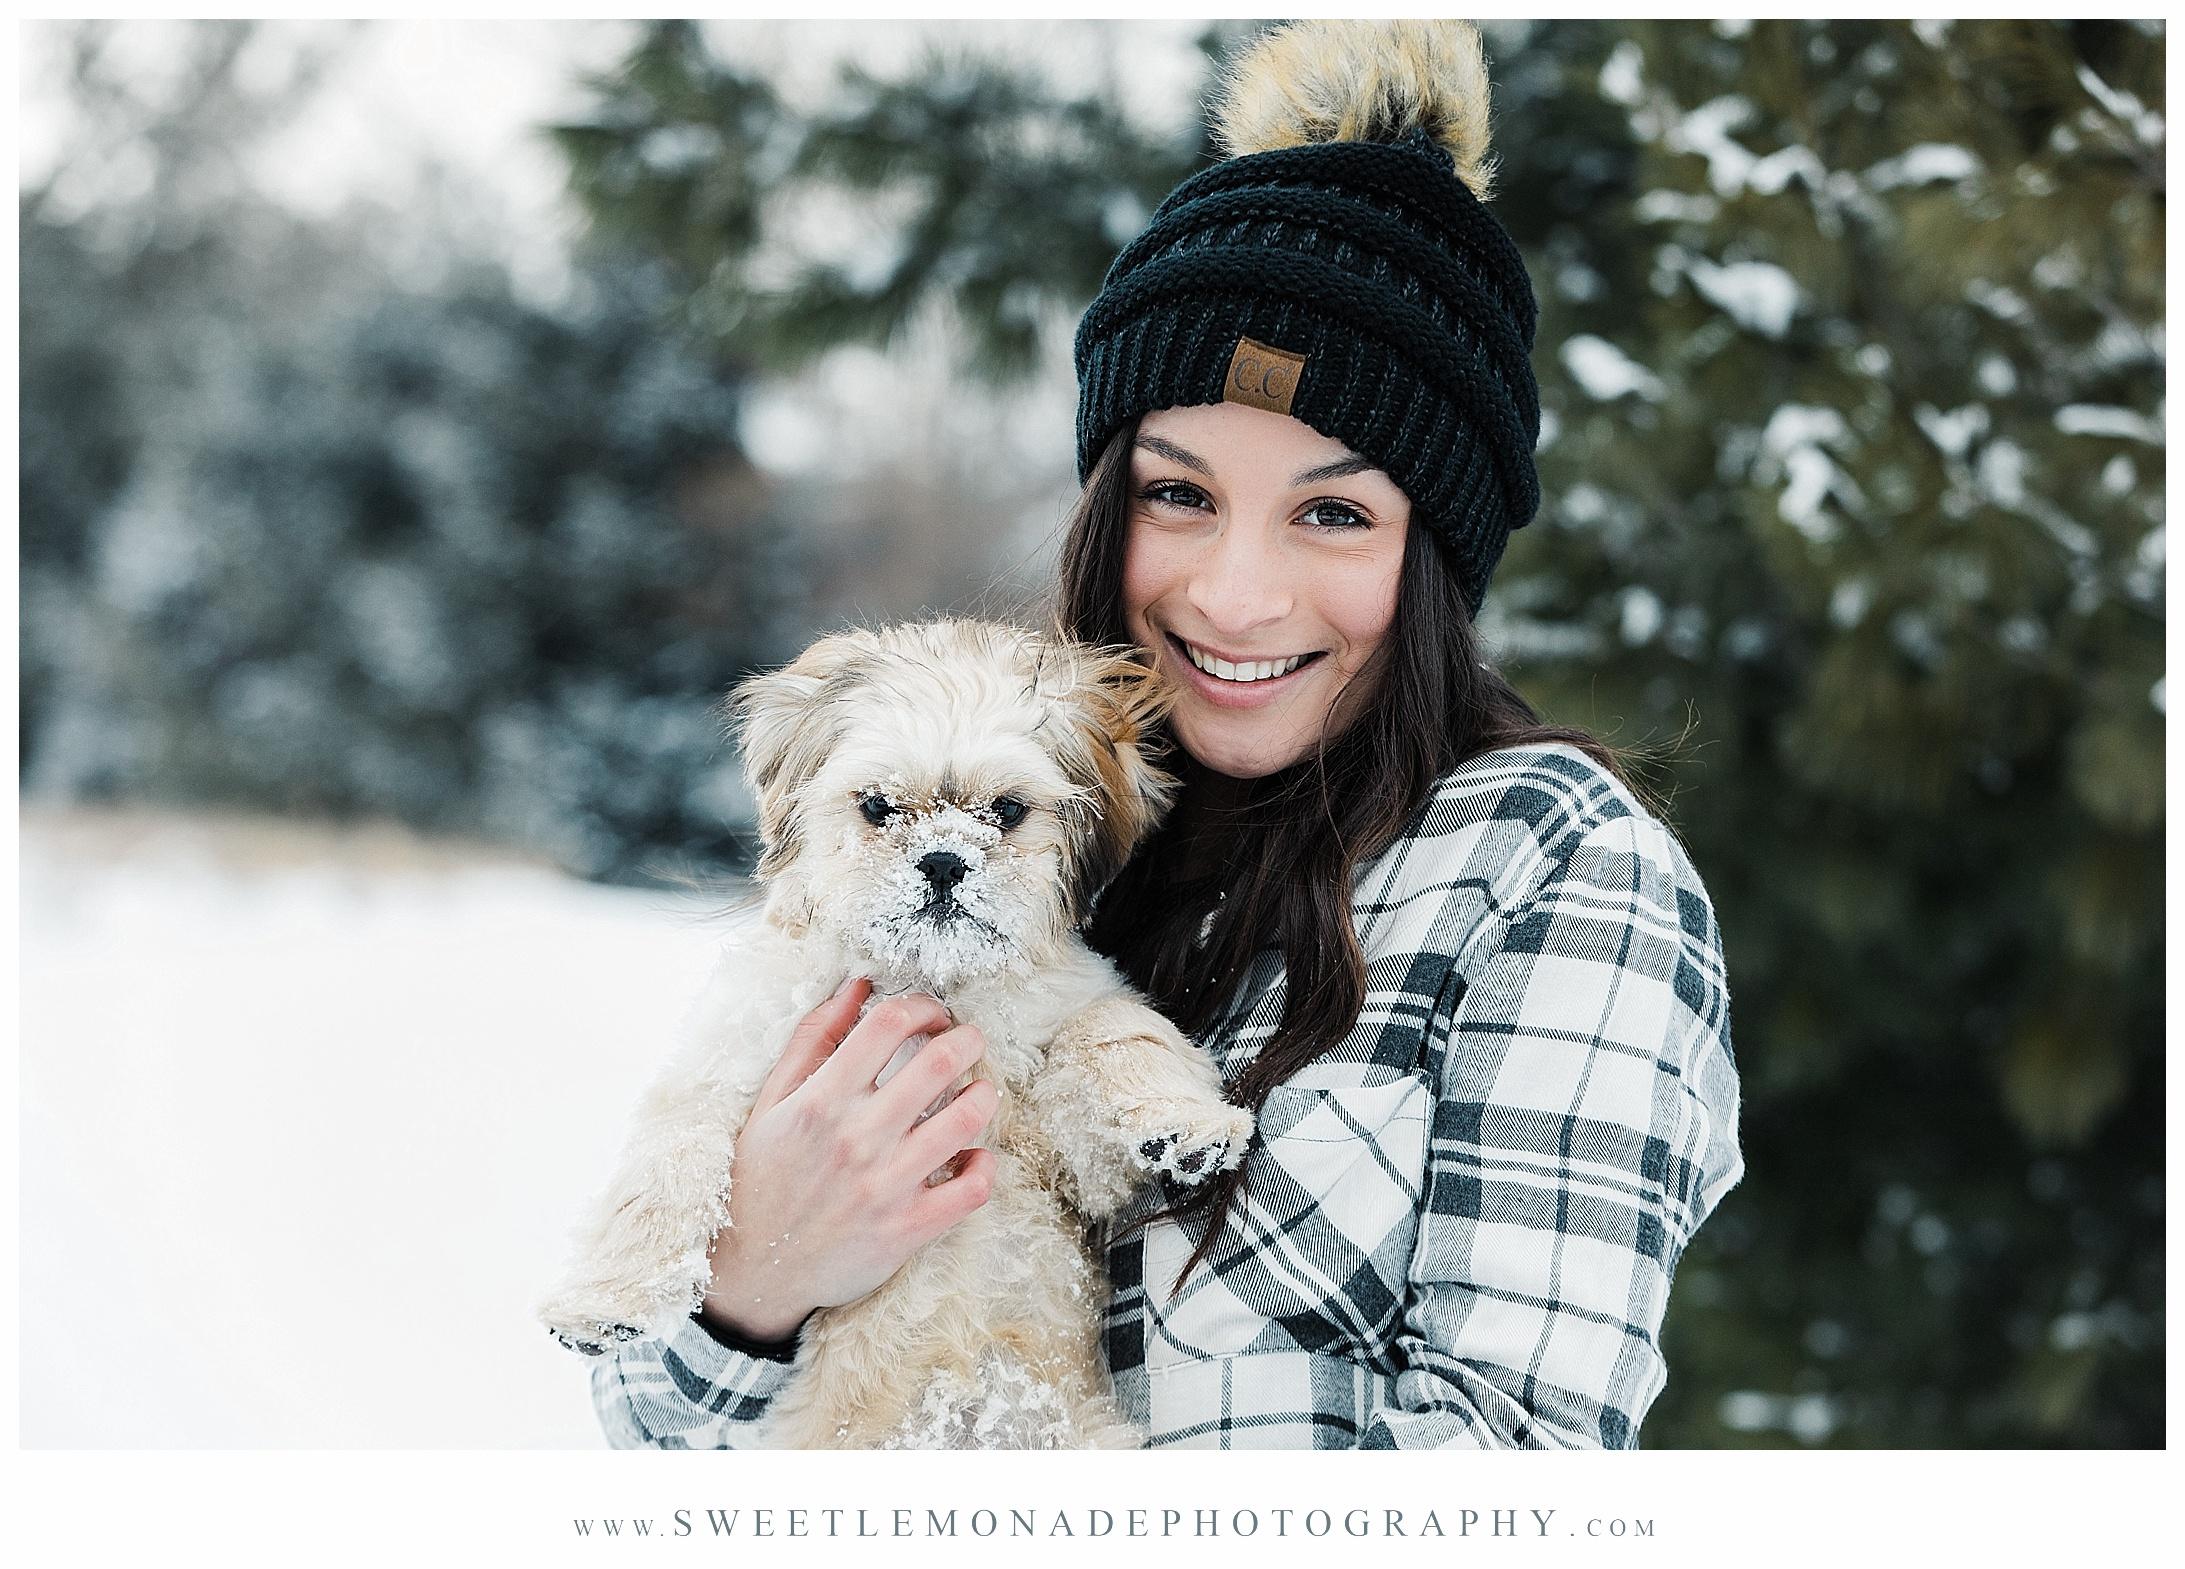 mahomet-illinois-snow-senior-pics-winter-dog-sweet-lemonade-photography_2081.jpg